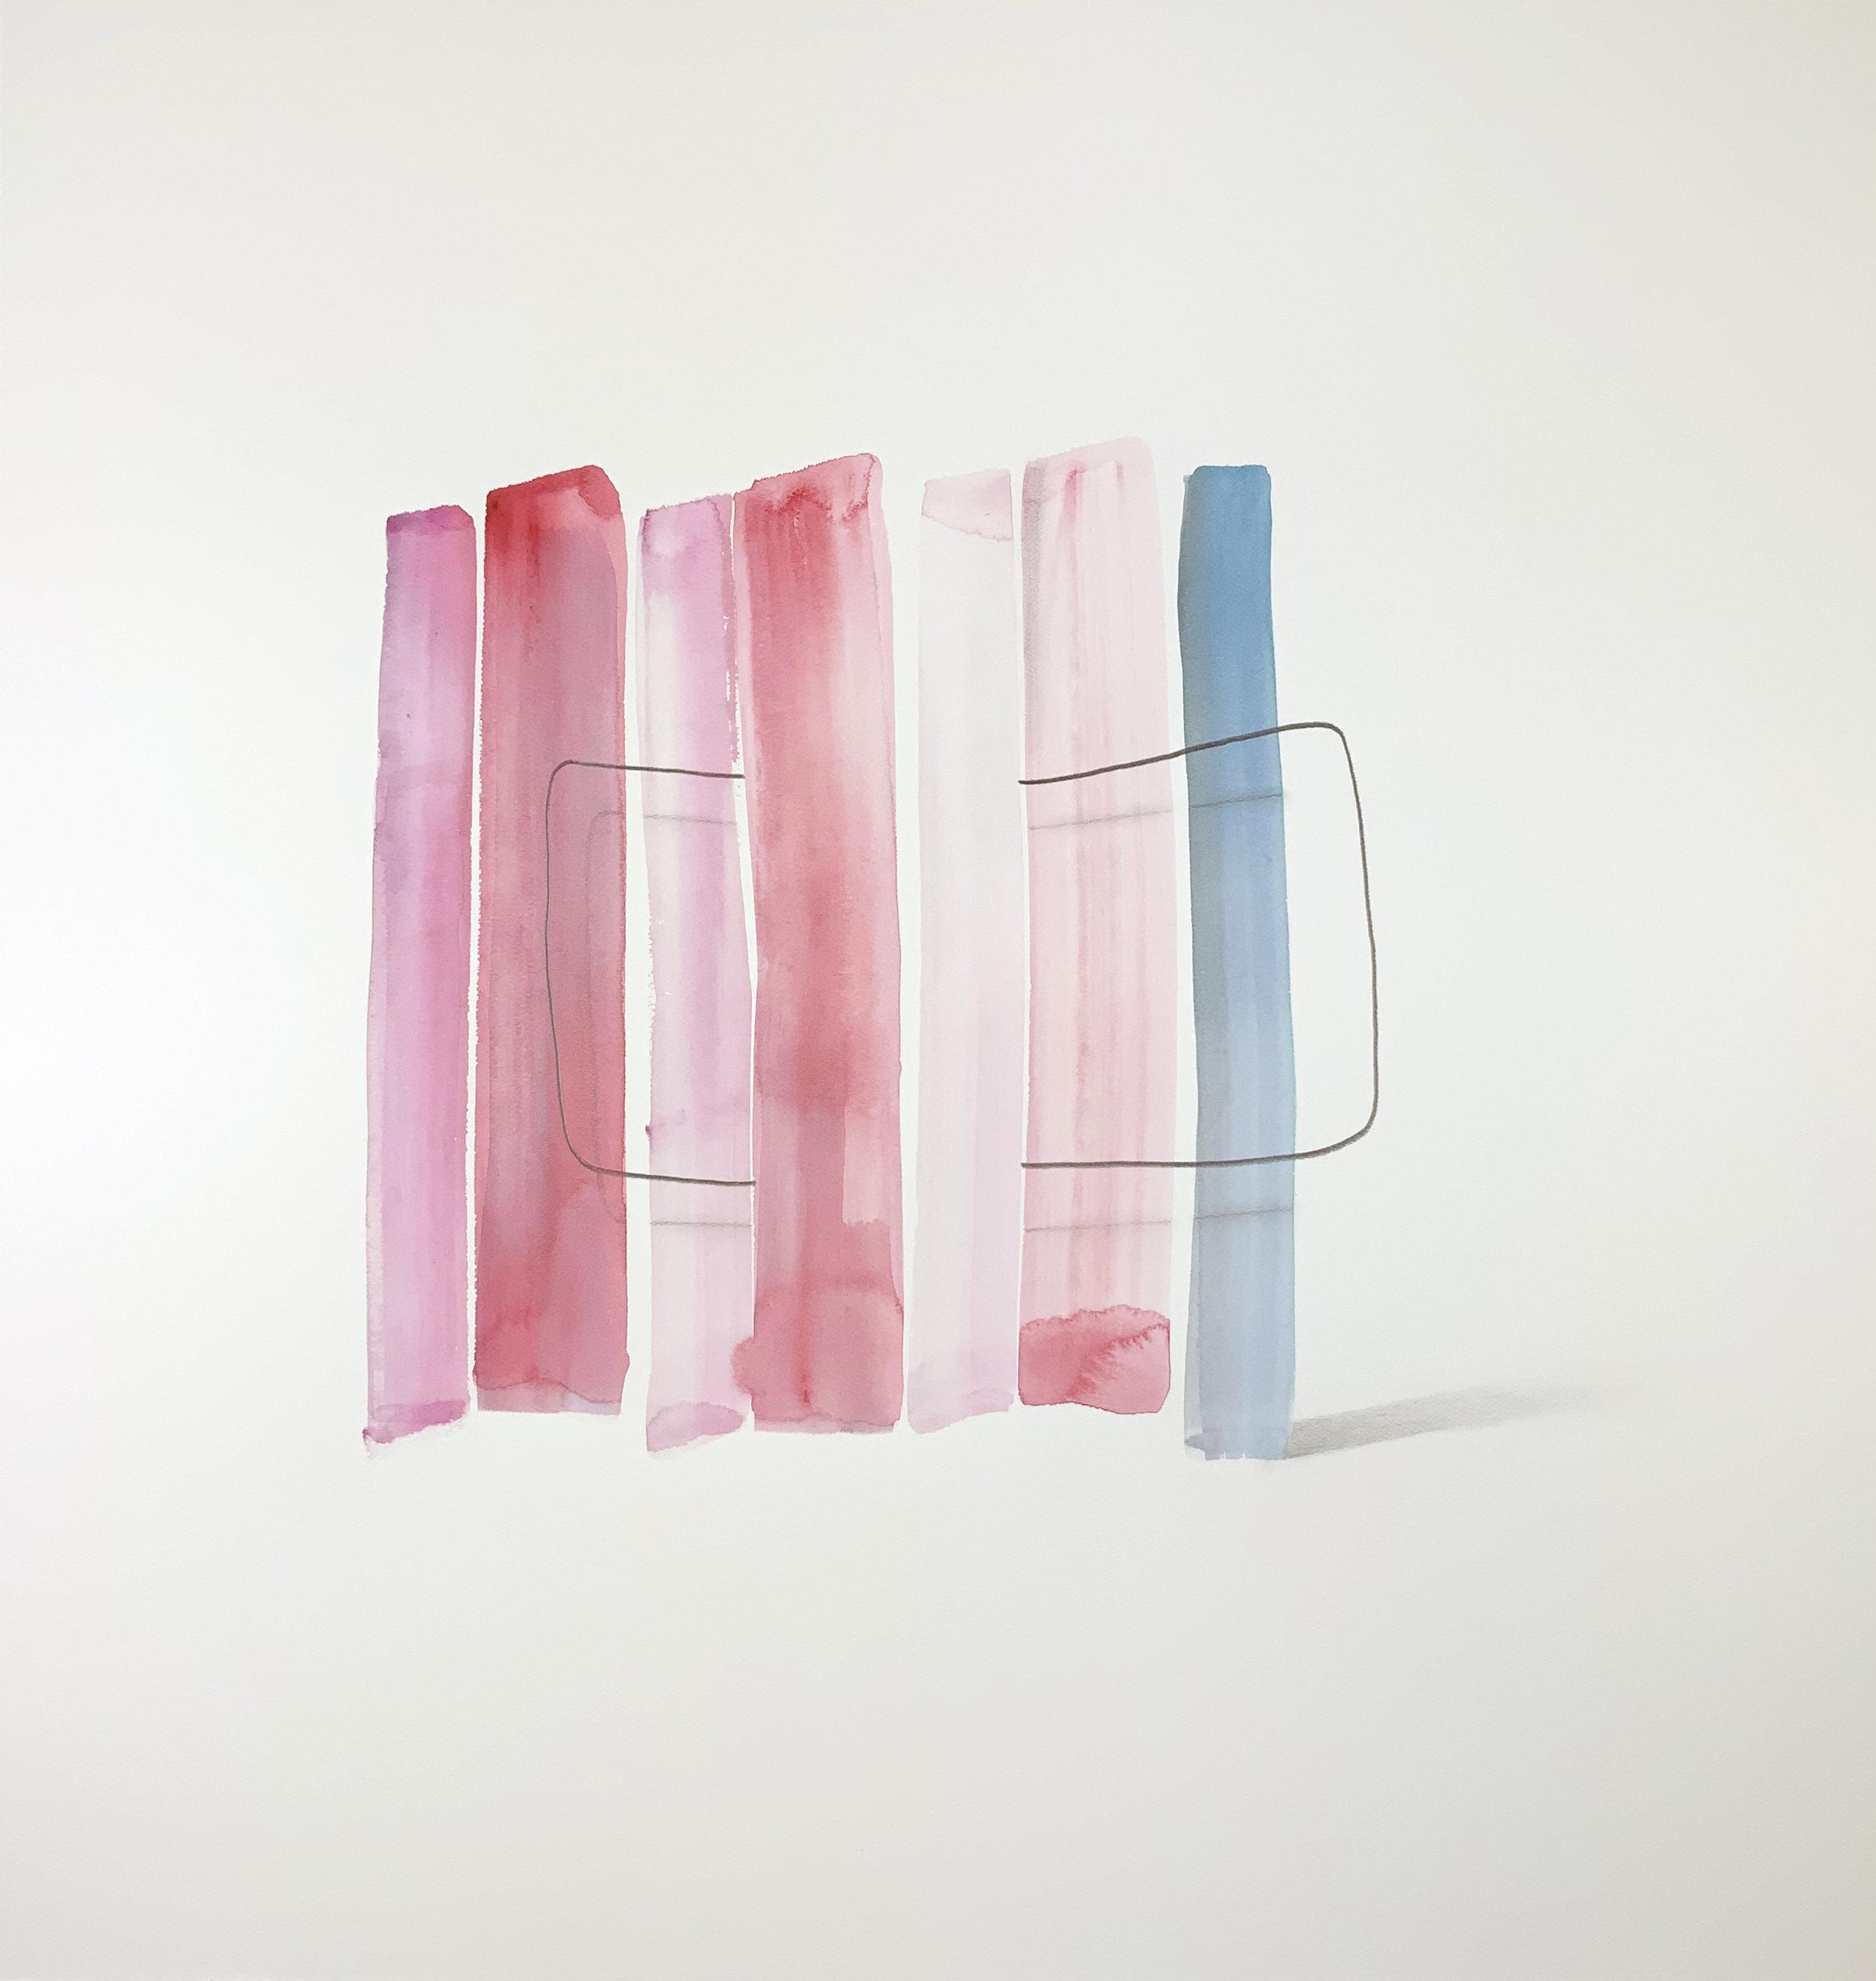 AdahRoseG Wesley Berg Untitled W021  2019 Gouache and Graphite on Paper 23x22 unframed $1000jpg.jpg